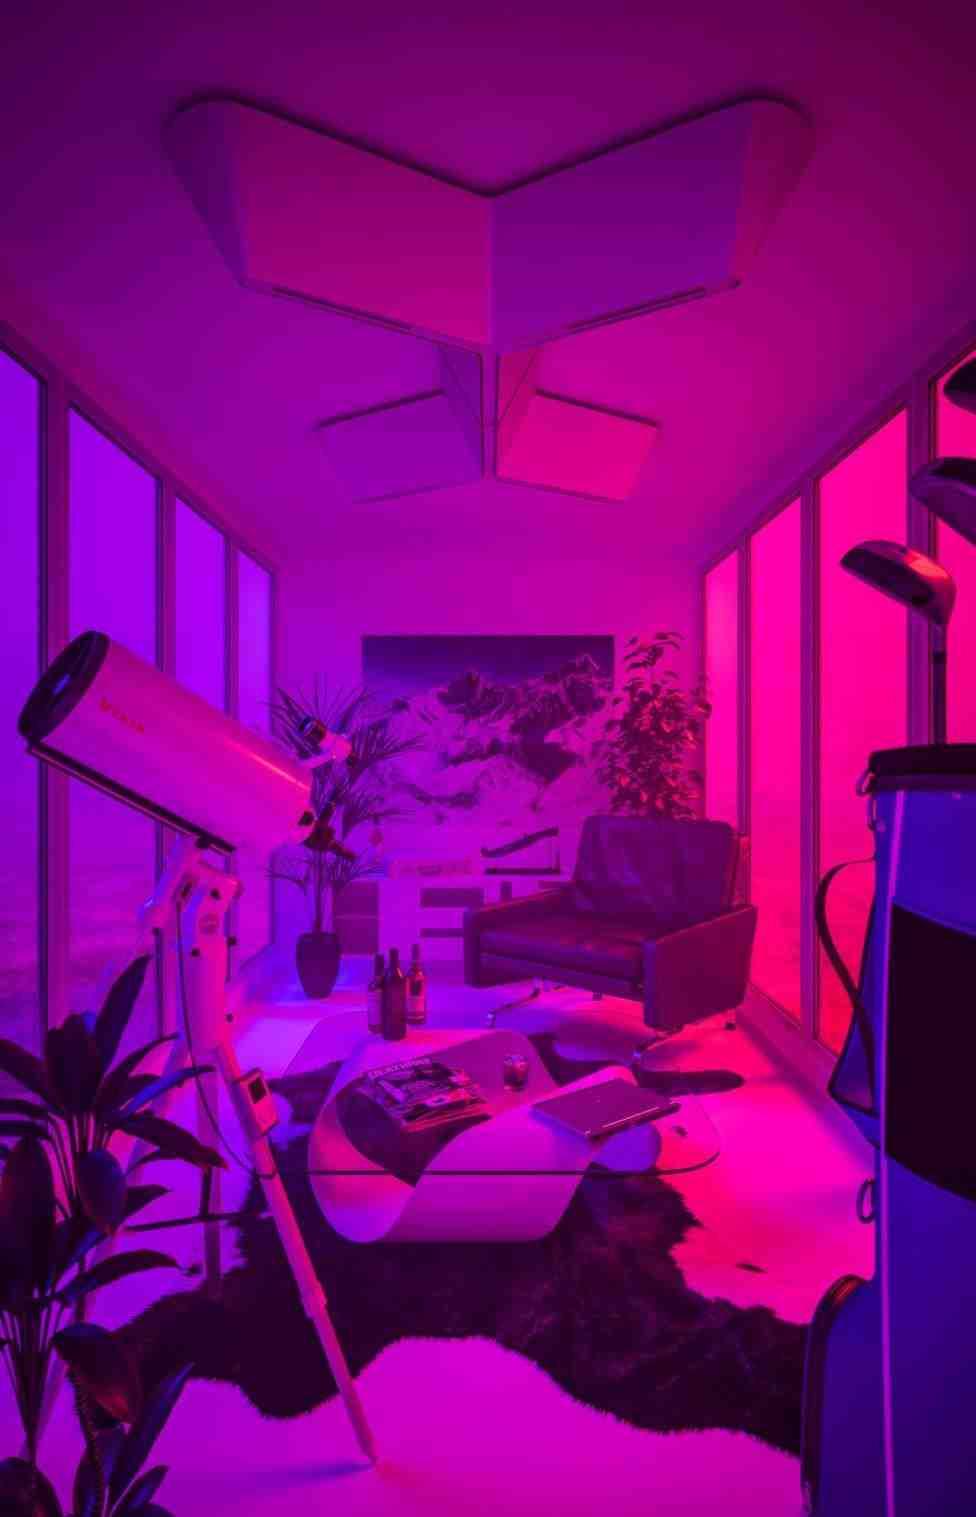 Purple Aesthetic Wallpapers - Top Free Purple Aesthetic ...